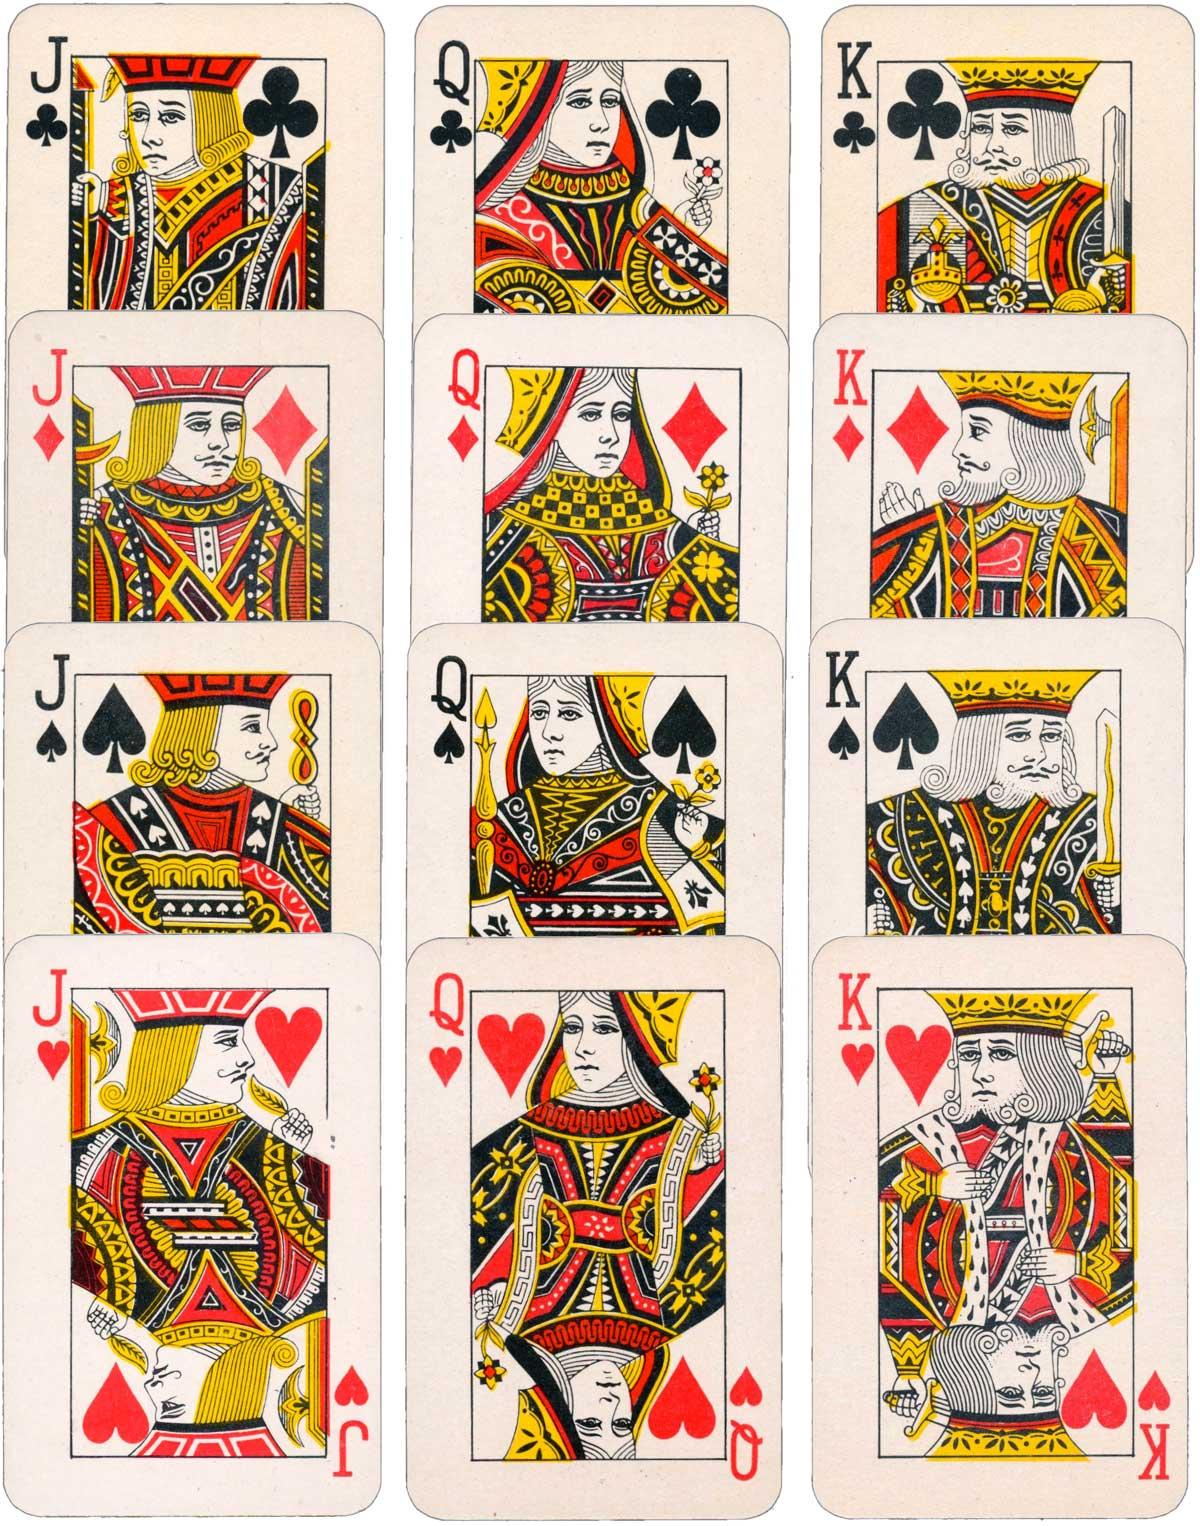 Parksons Bridge Poker No.444